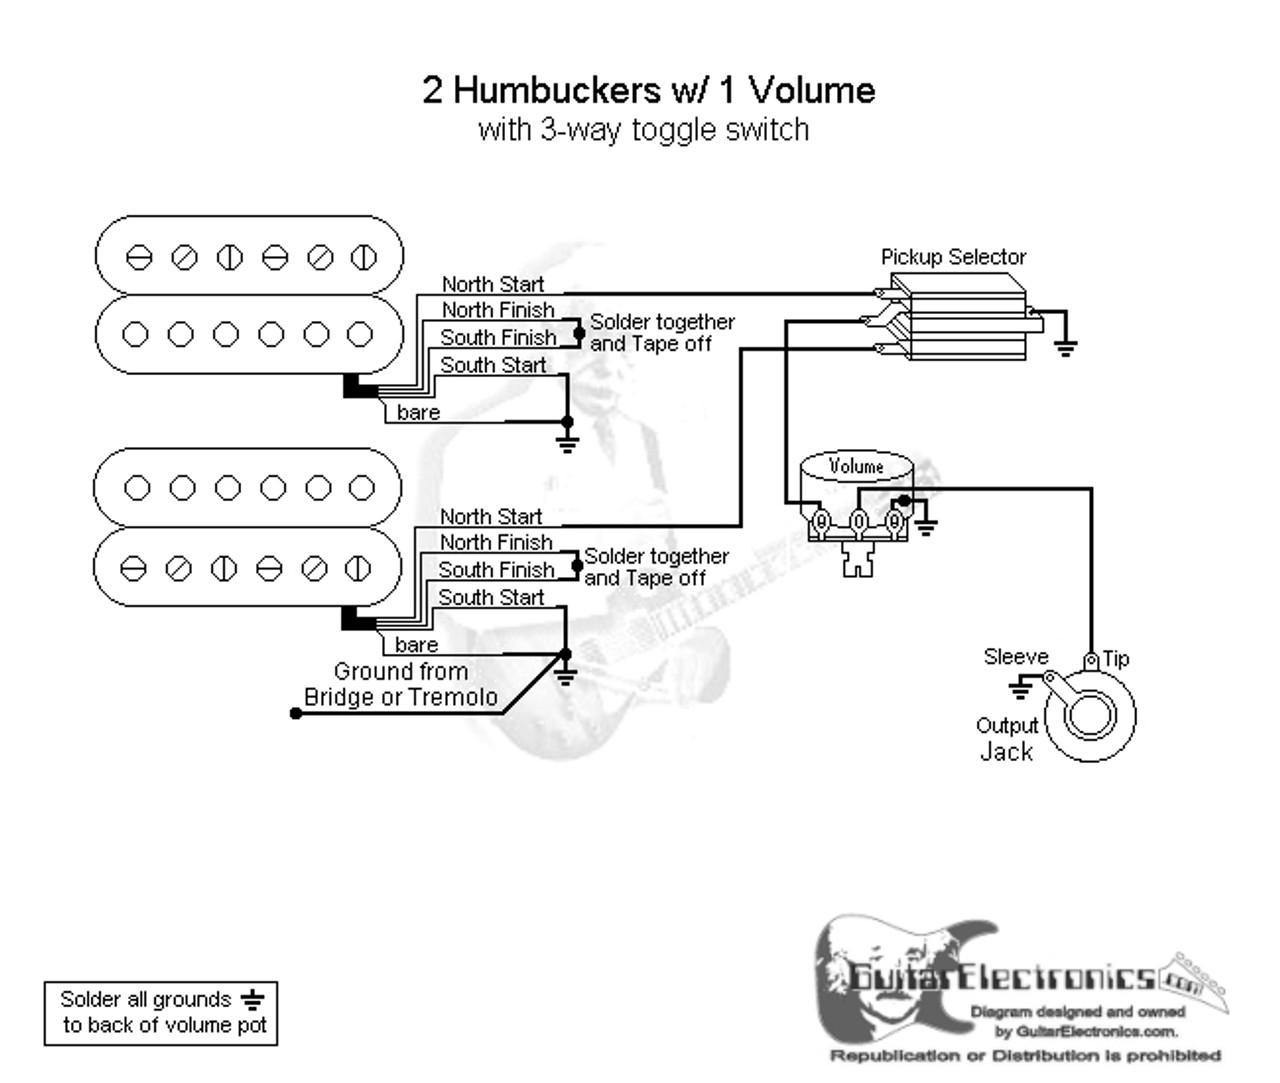 medium resolution of 2 humbuckers 3 way toggle switch 1 volume 2 pickup guitar wiring